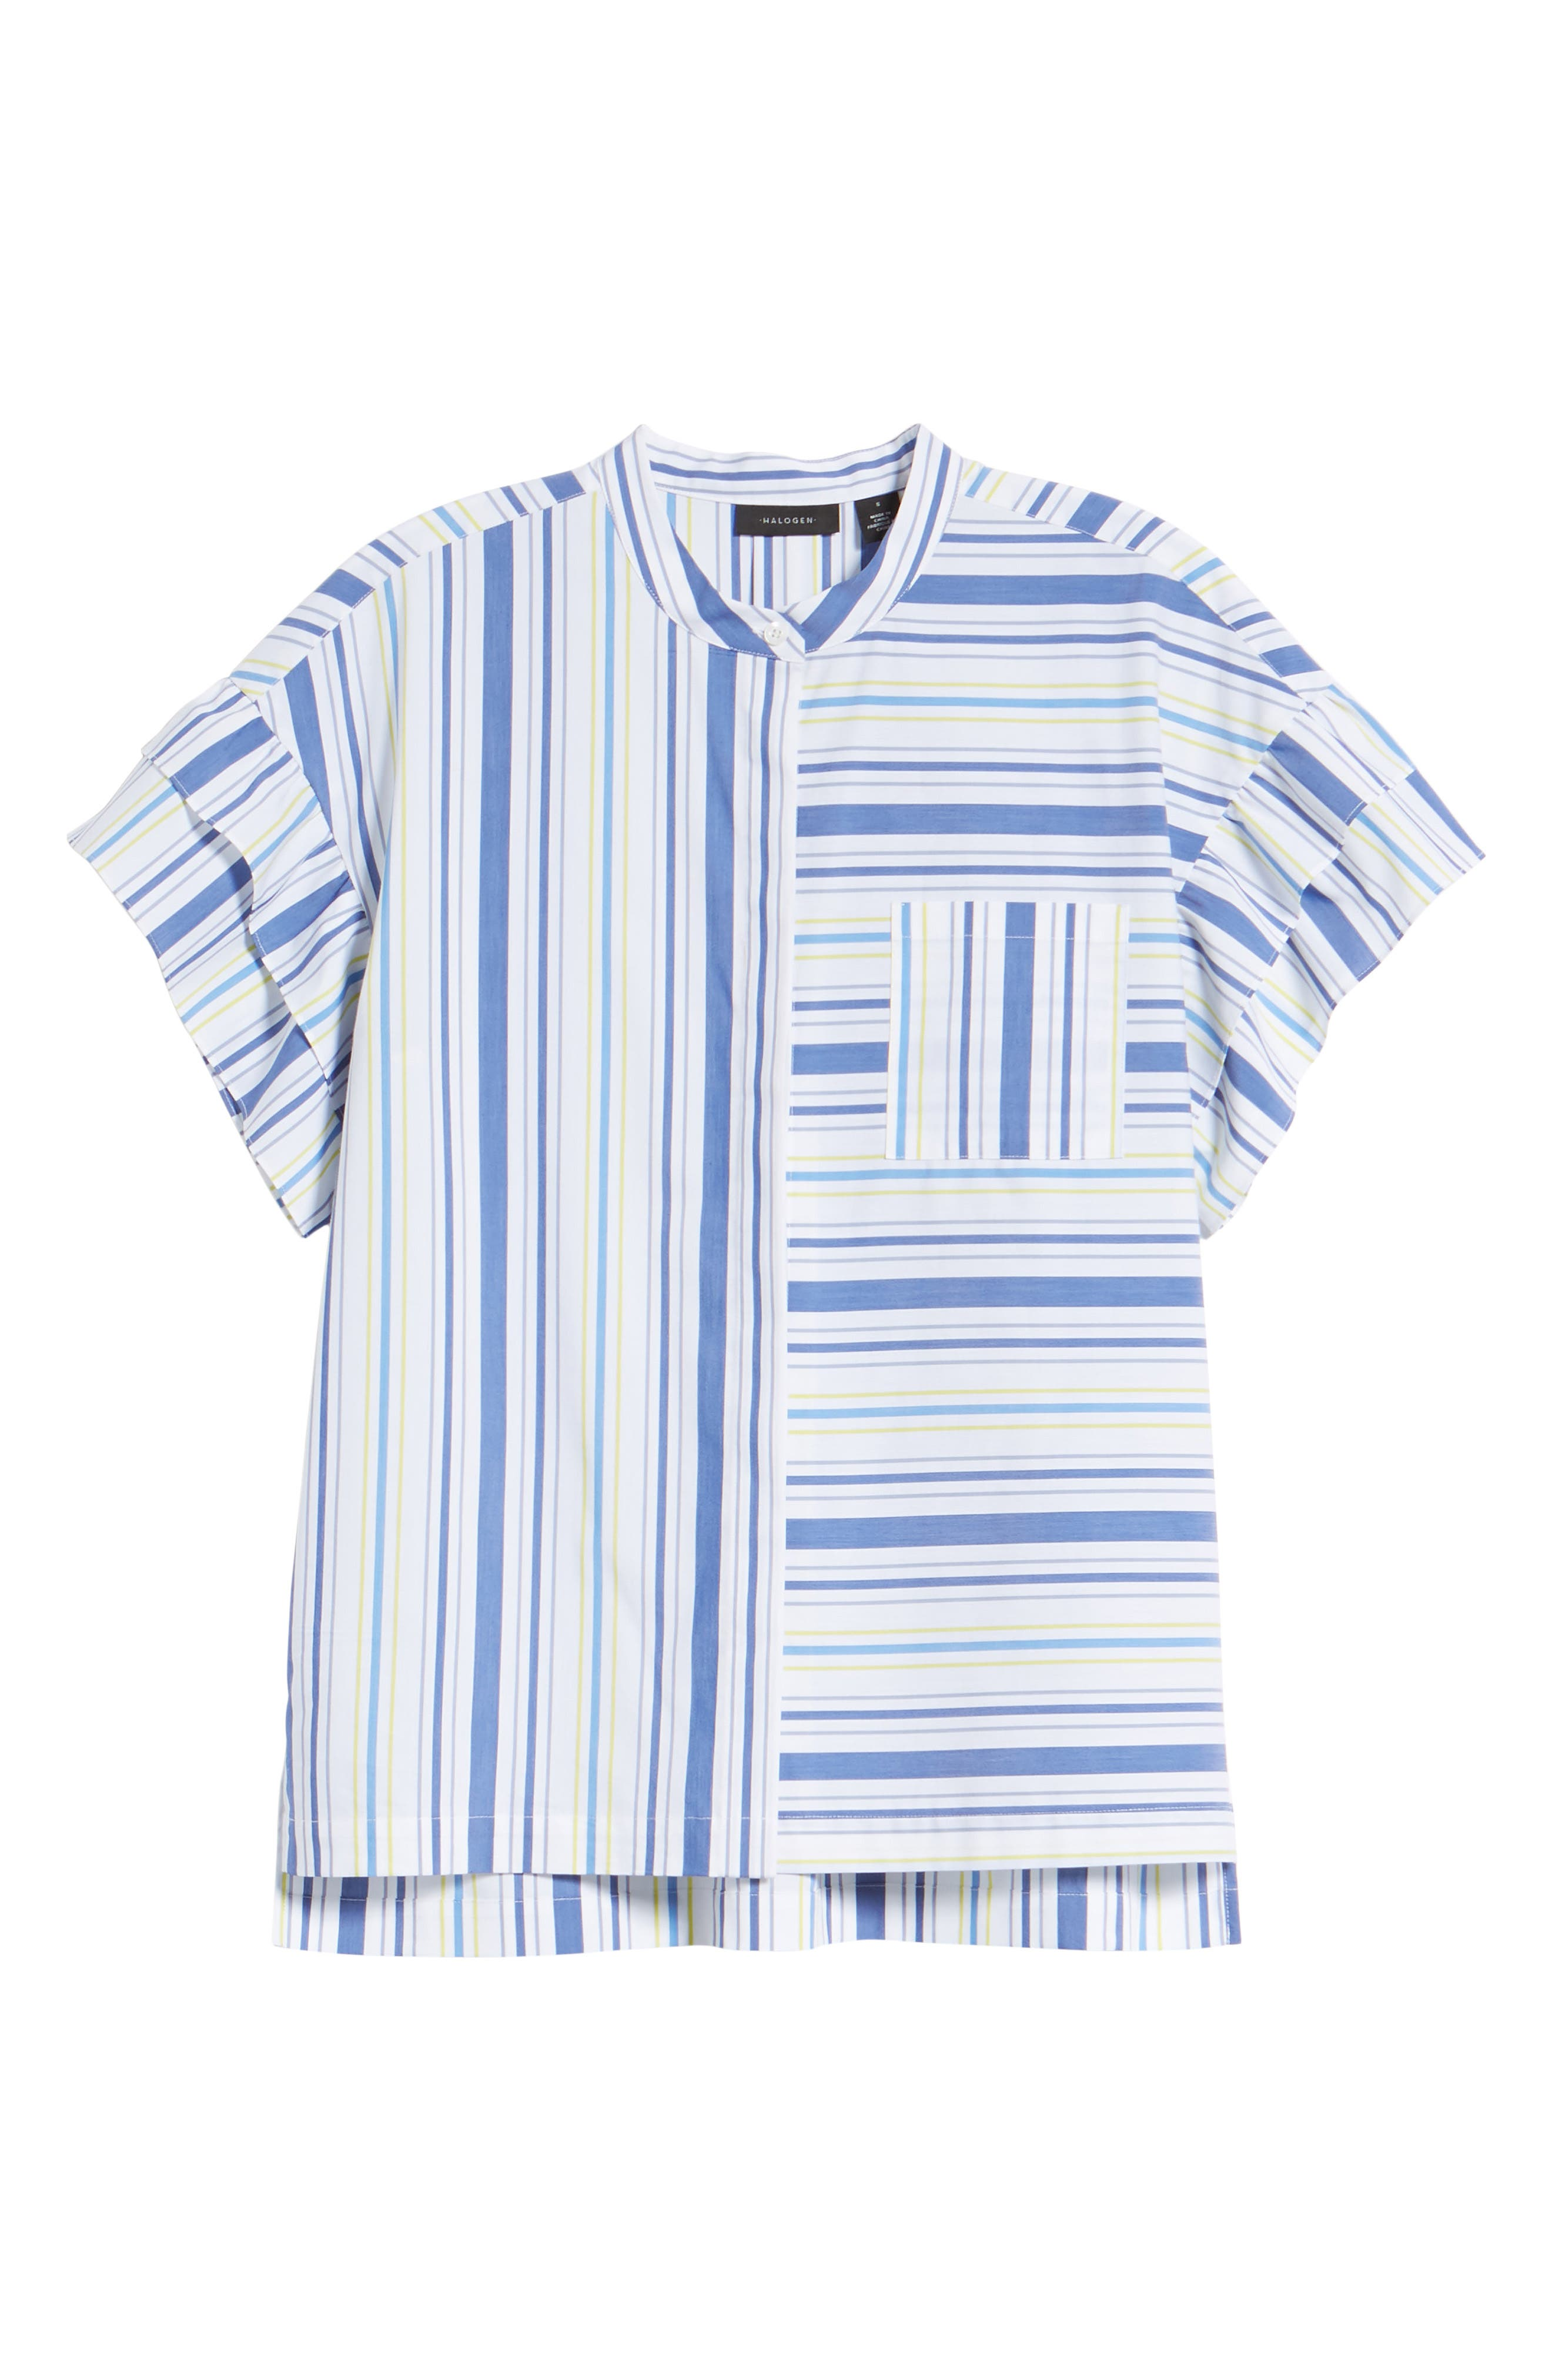 Ruffle Sleeve Stretch Cotton Blend Blouse,                             Alternate thumbnail 7, color,                             White Multi Stripe